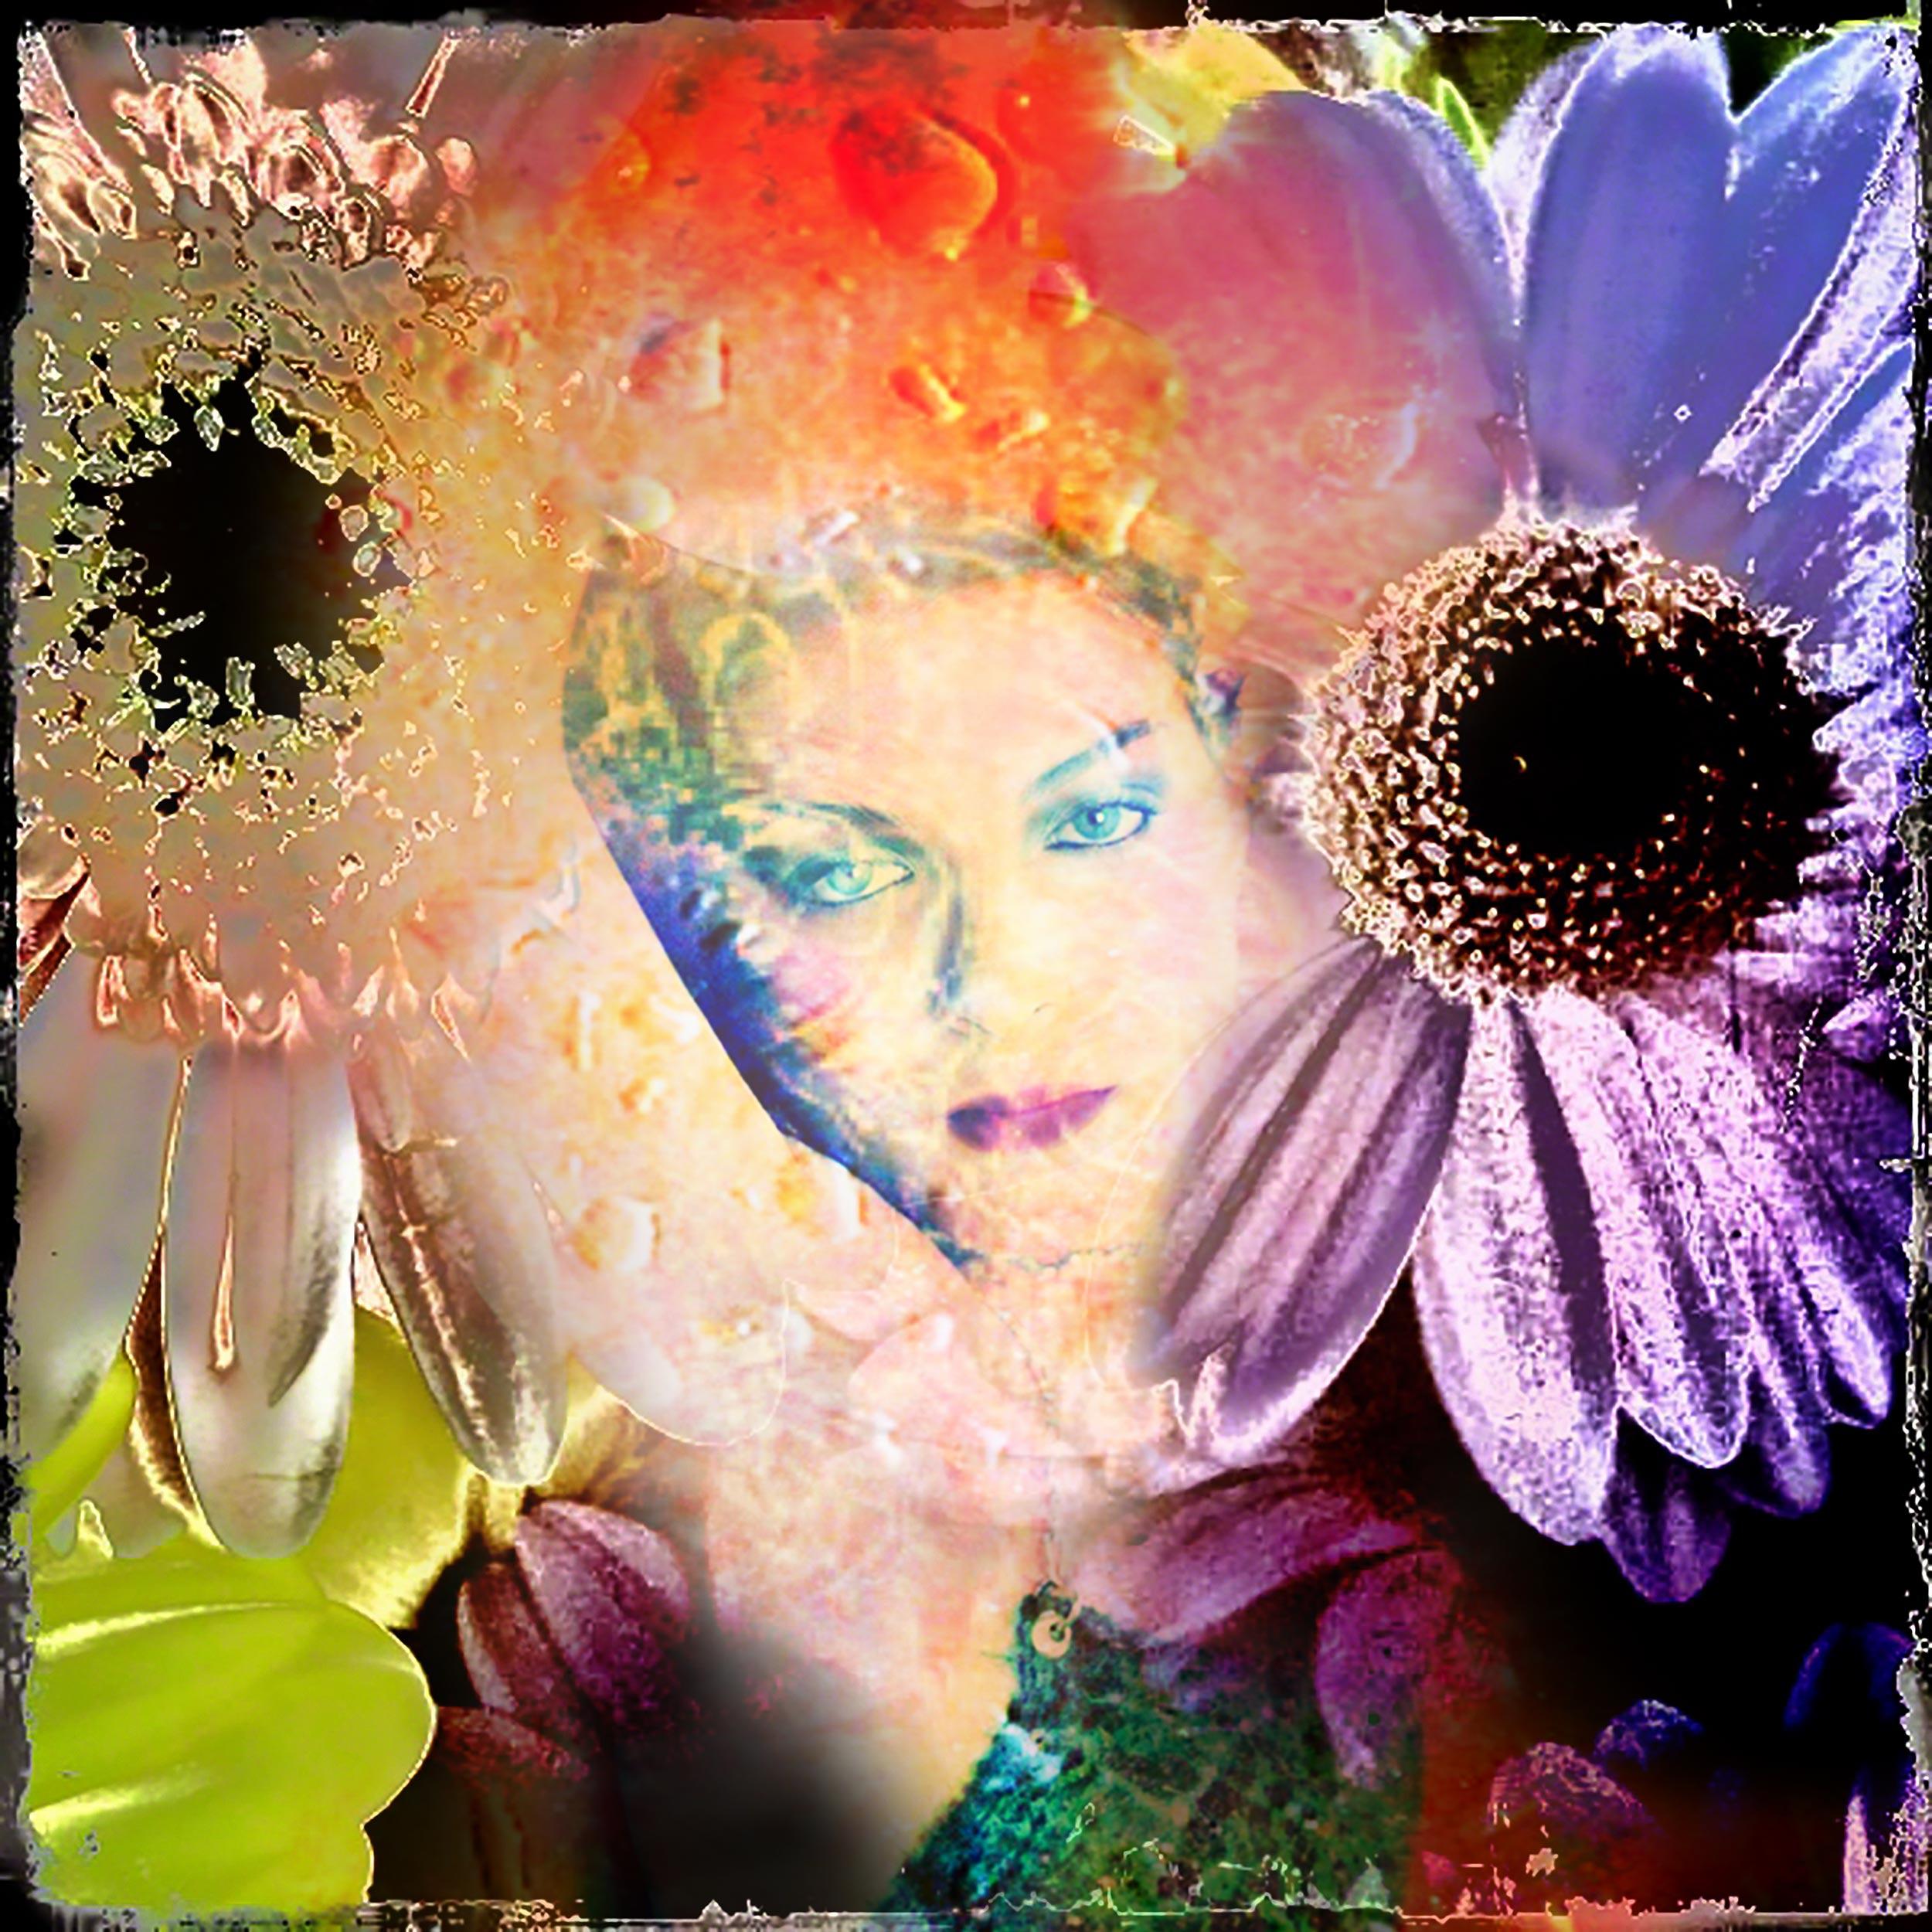 Cosmic-Beauty-and-Solar-Flower-2.jpg